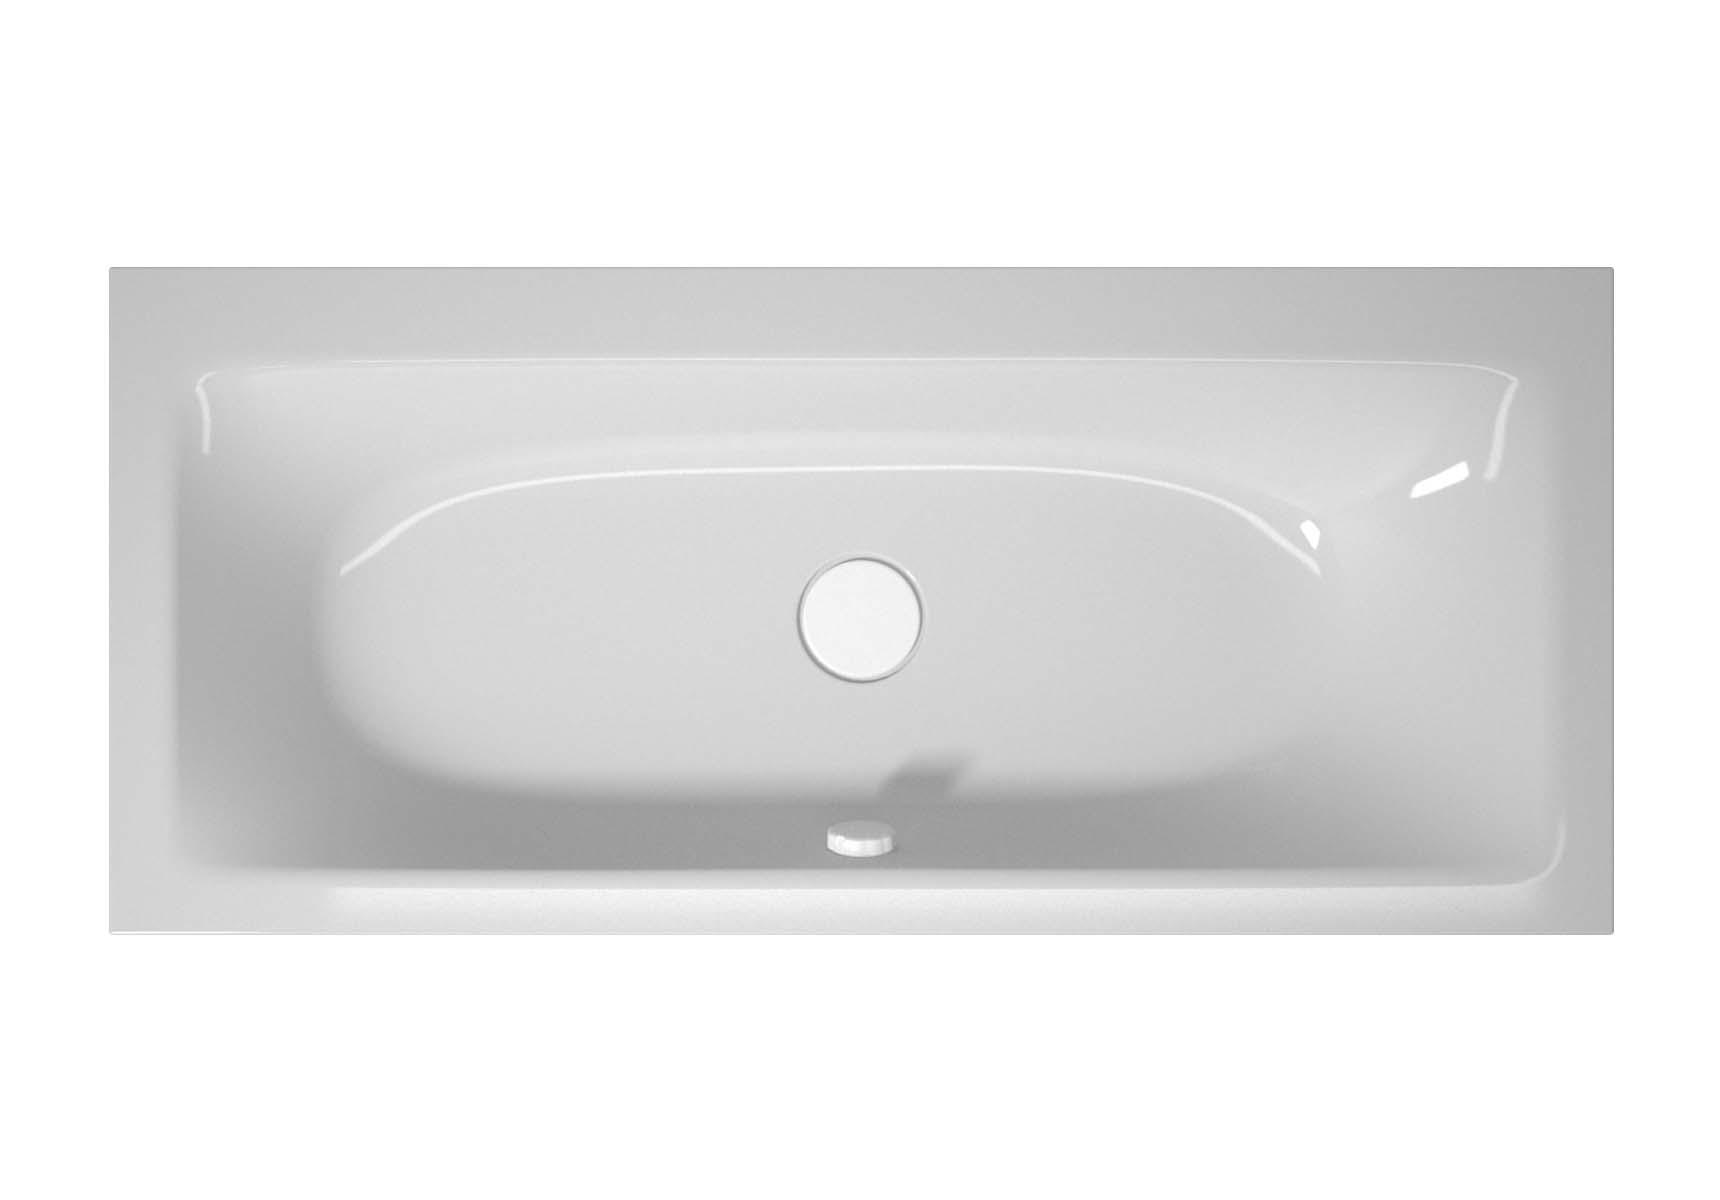 T4 180x80 cm Rectangular/Double-Sided Aqua Maxi